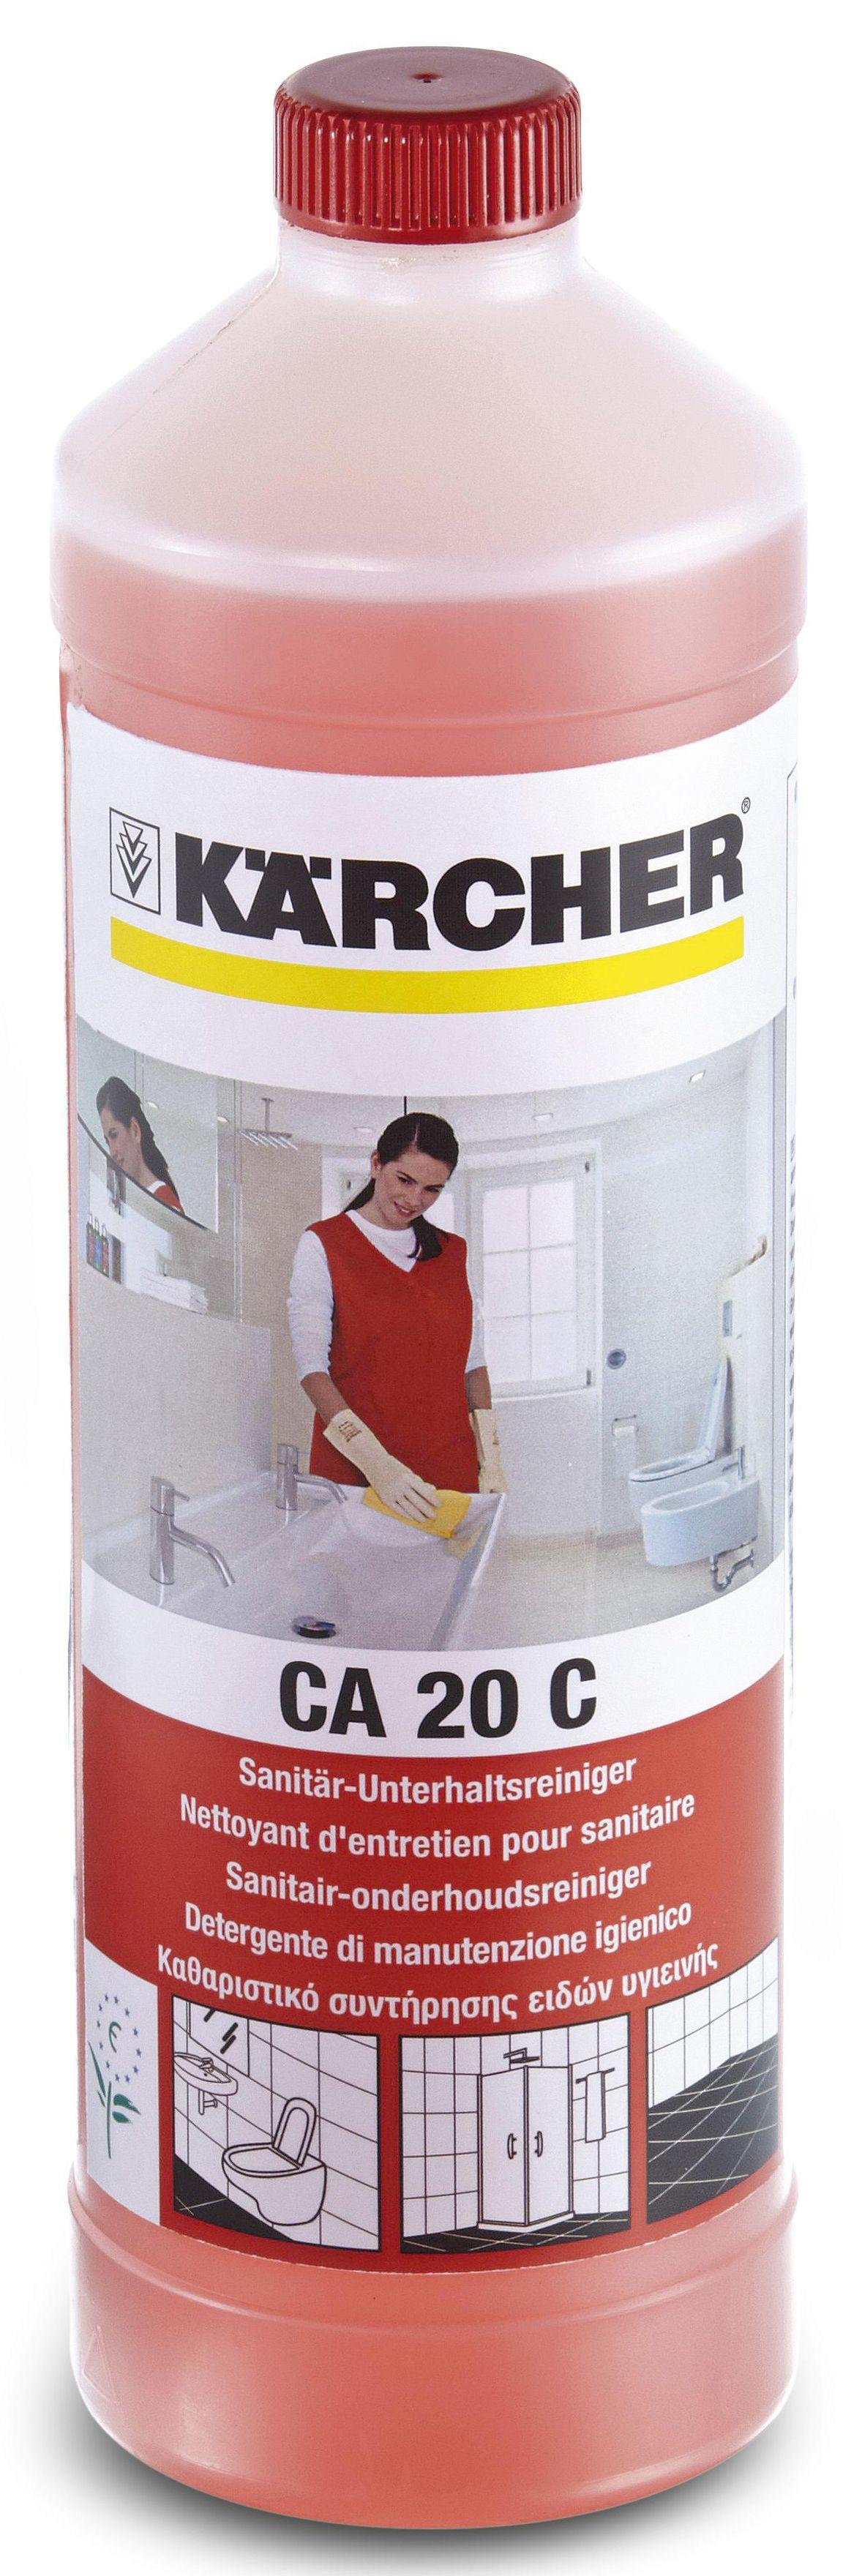 Kärcher Rengjøring CA 20 C 1L (flaske med 1 l) 6.295-695.0